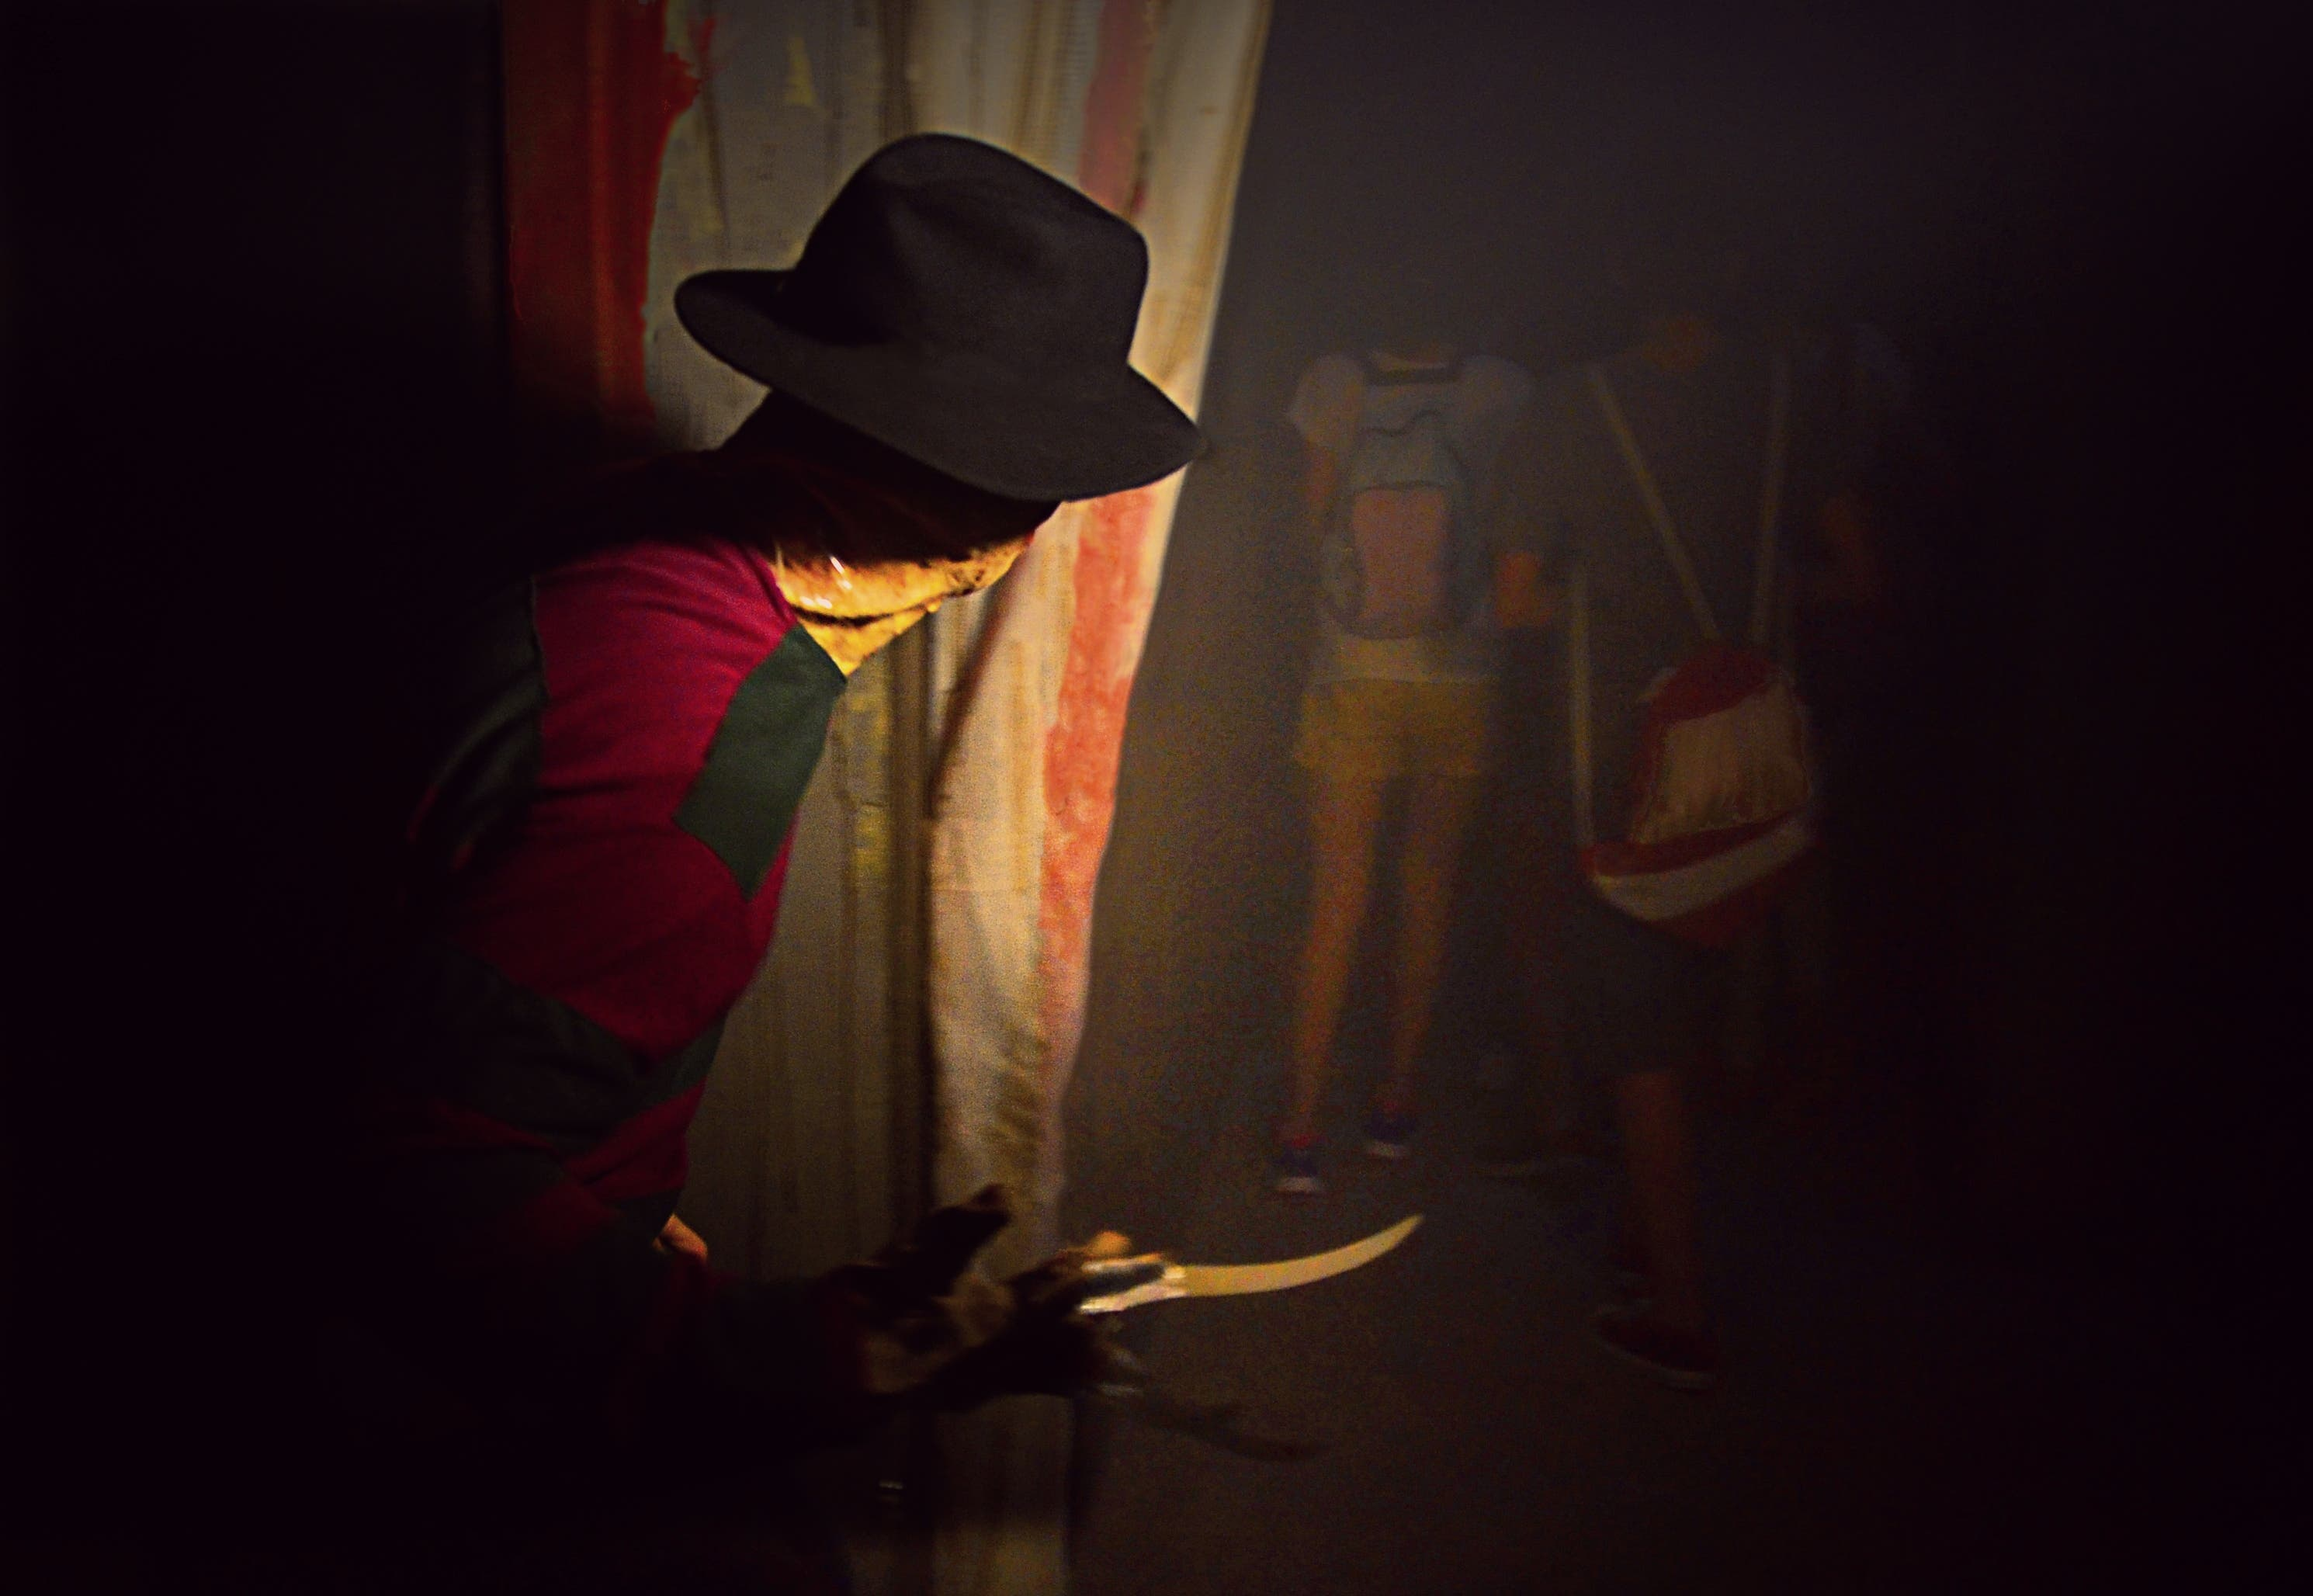 Parque Warner - Halloween - Pasaje Freddy Krueger2